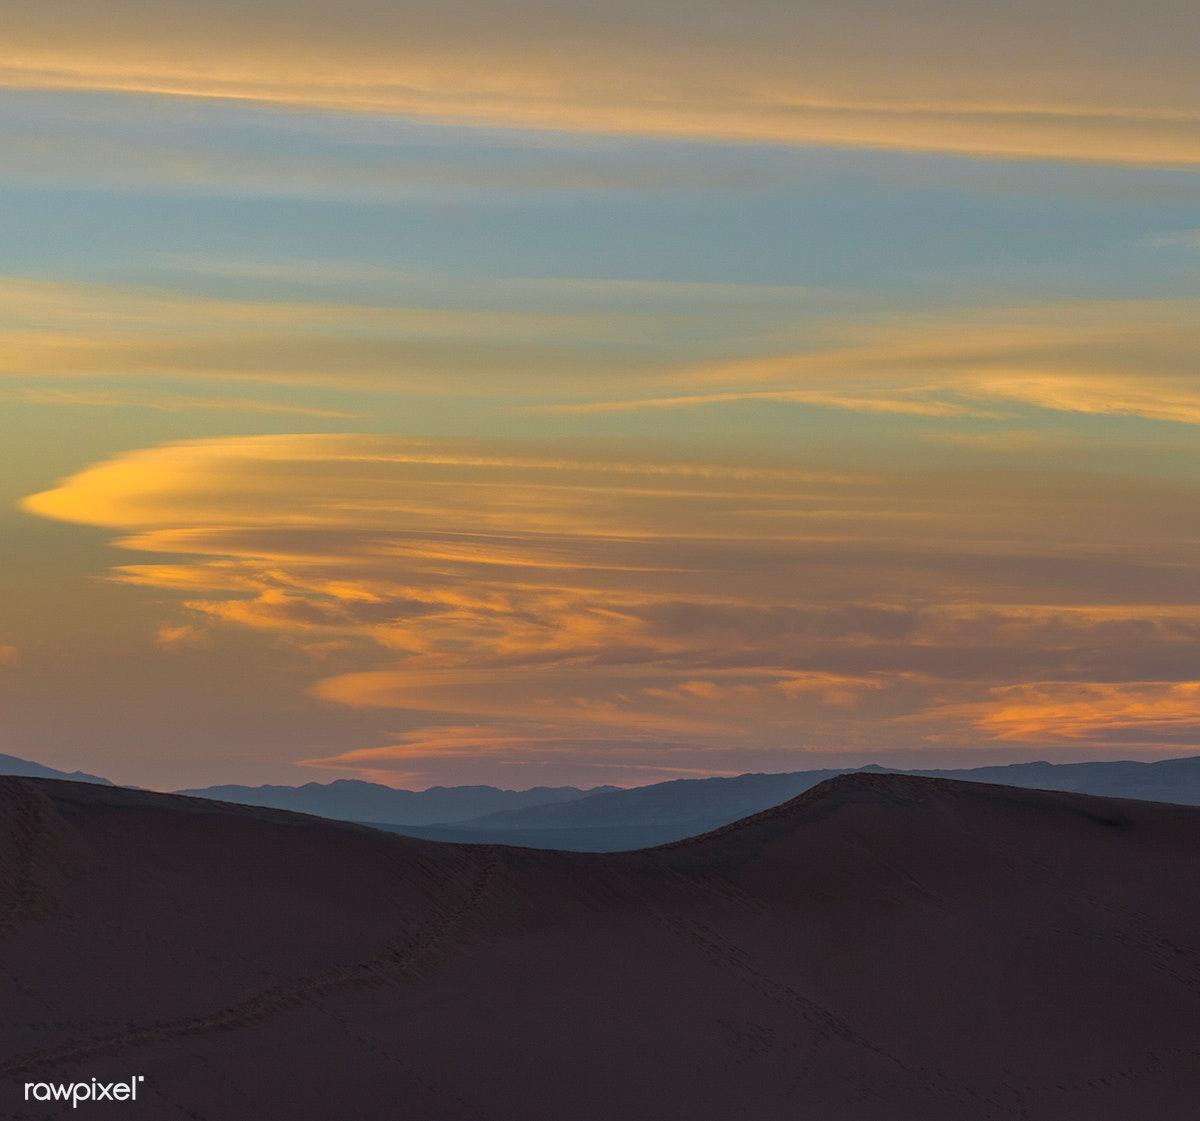 Sunrise over a beautiful desert | Free stock photo - 430235